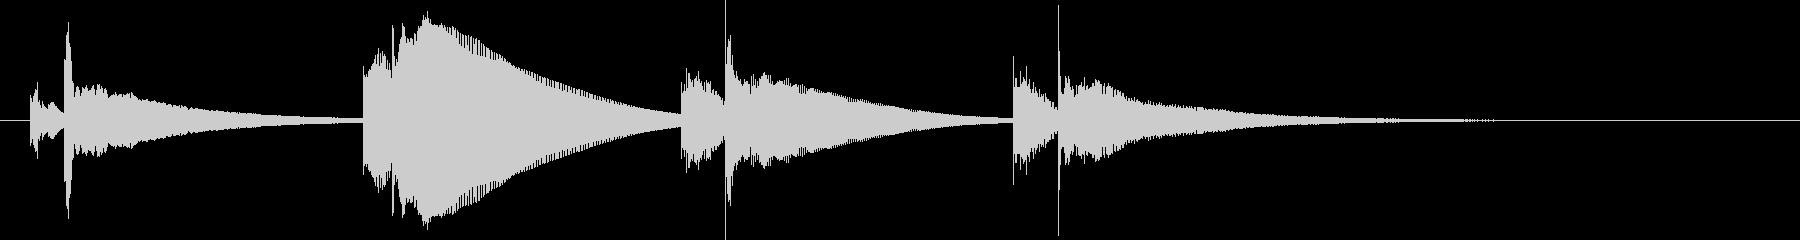 Vibraphone:降下ドロップ...の未再生の波形